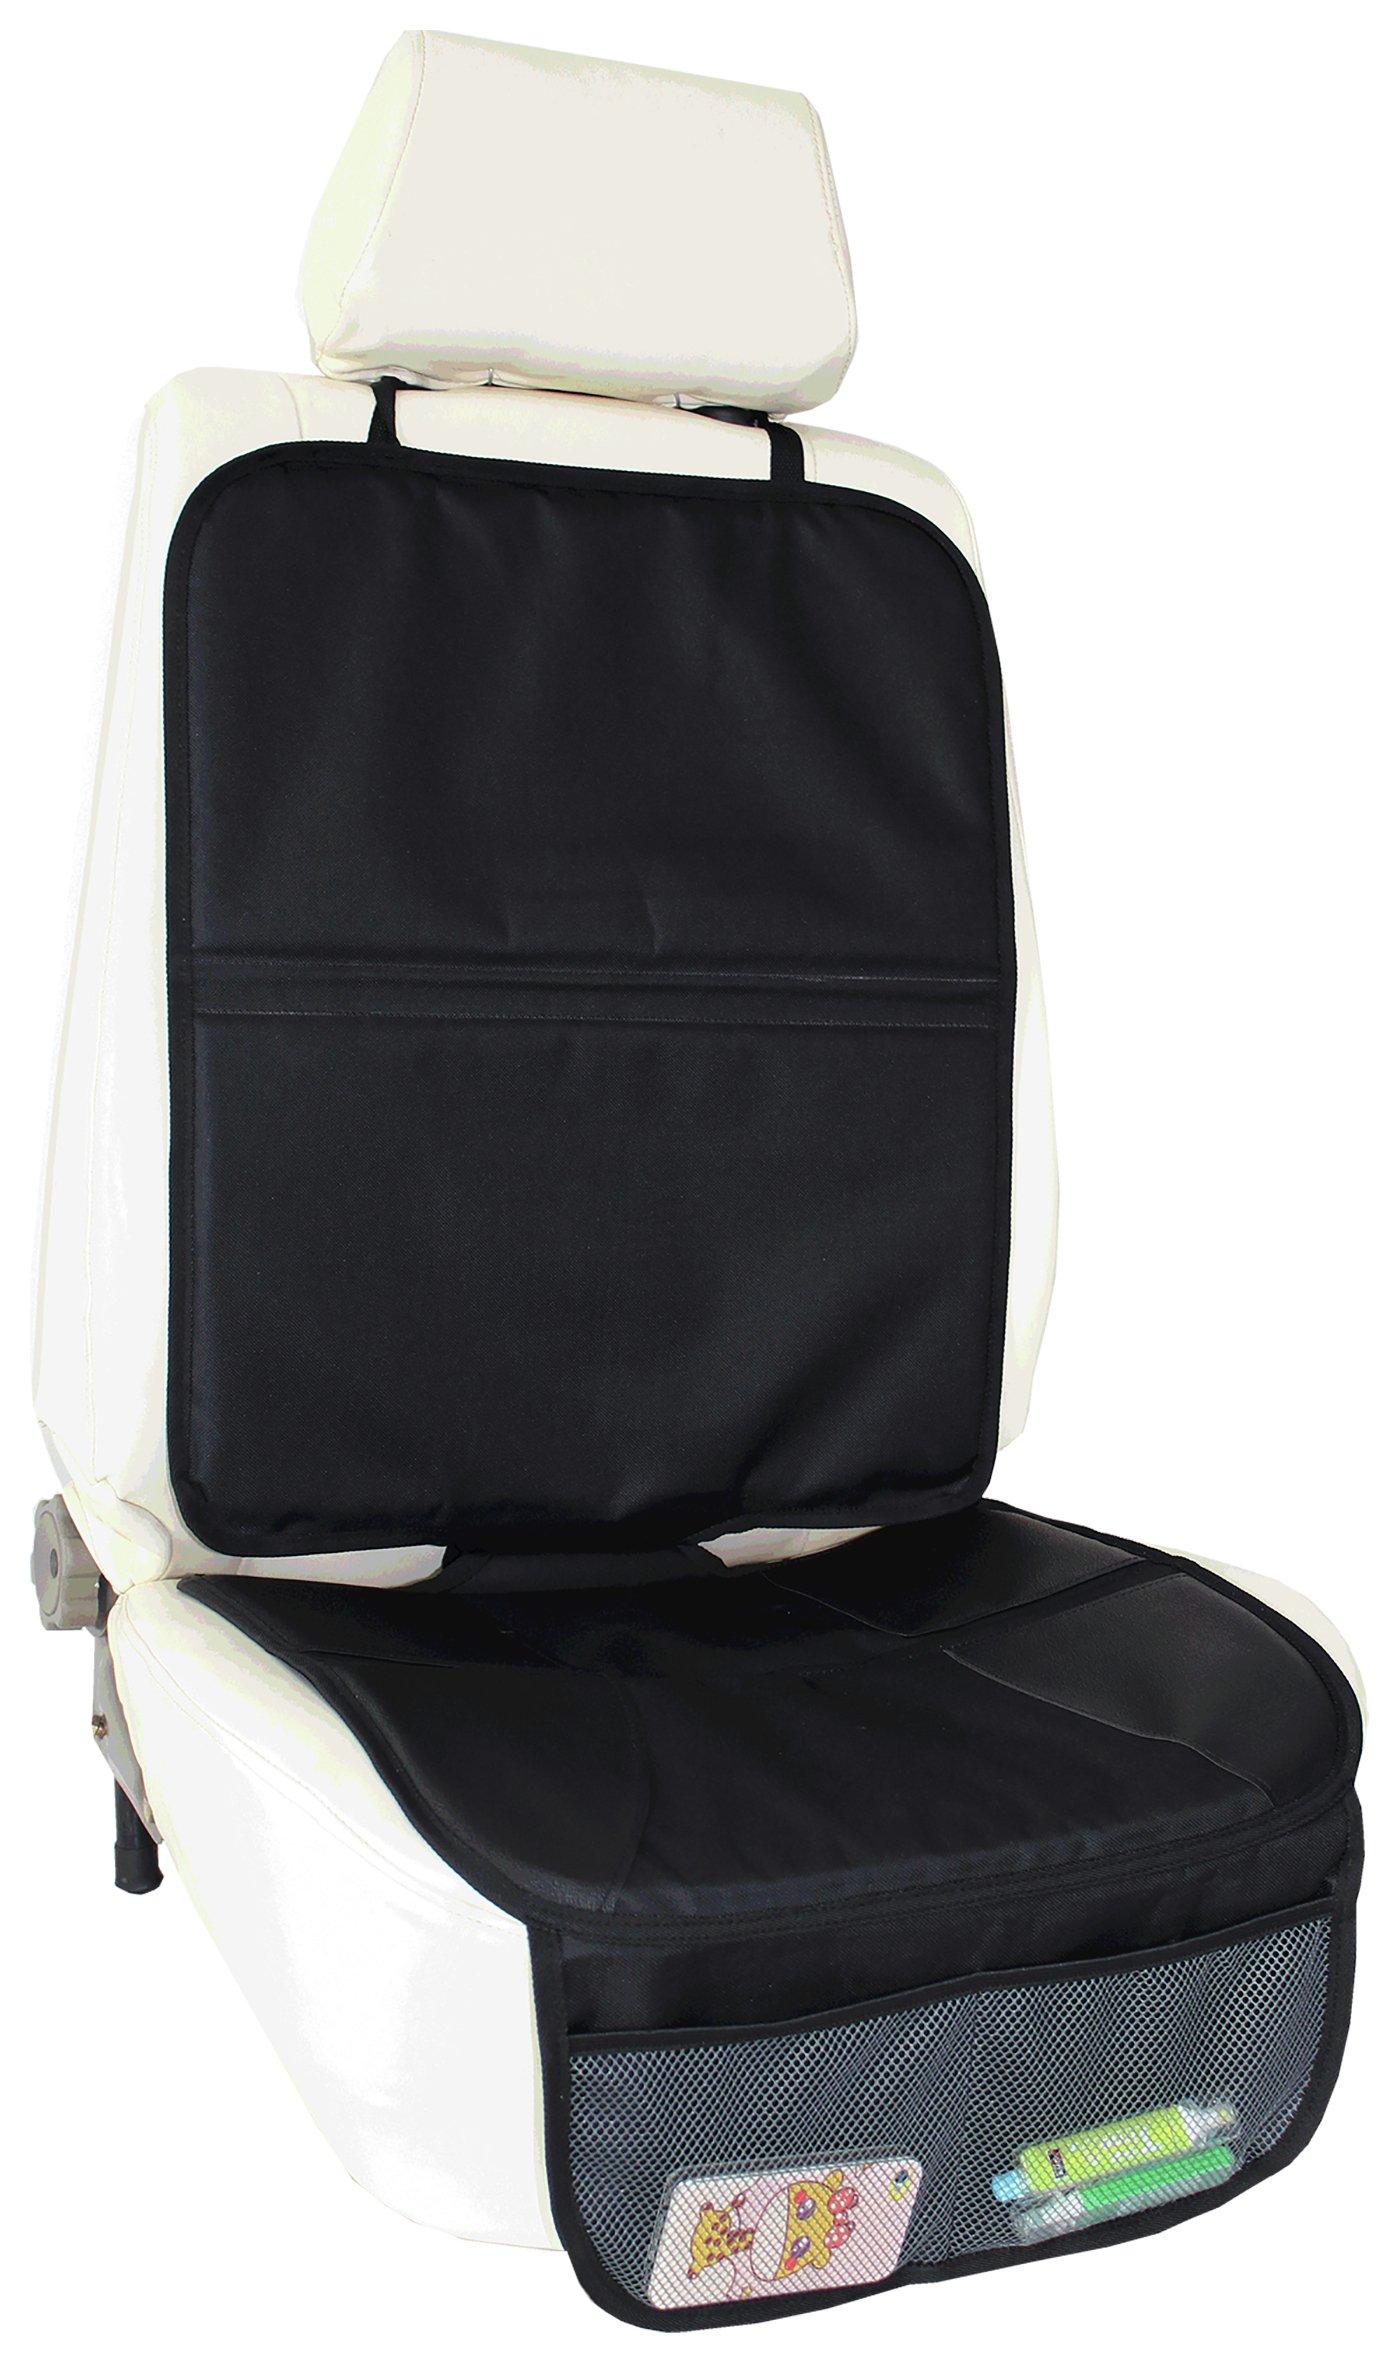 Babydan Car Seat Protector with Storage